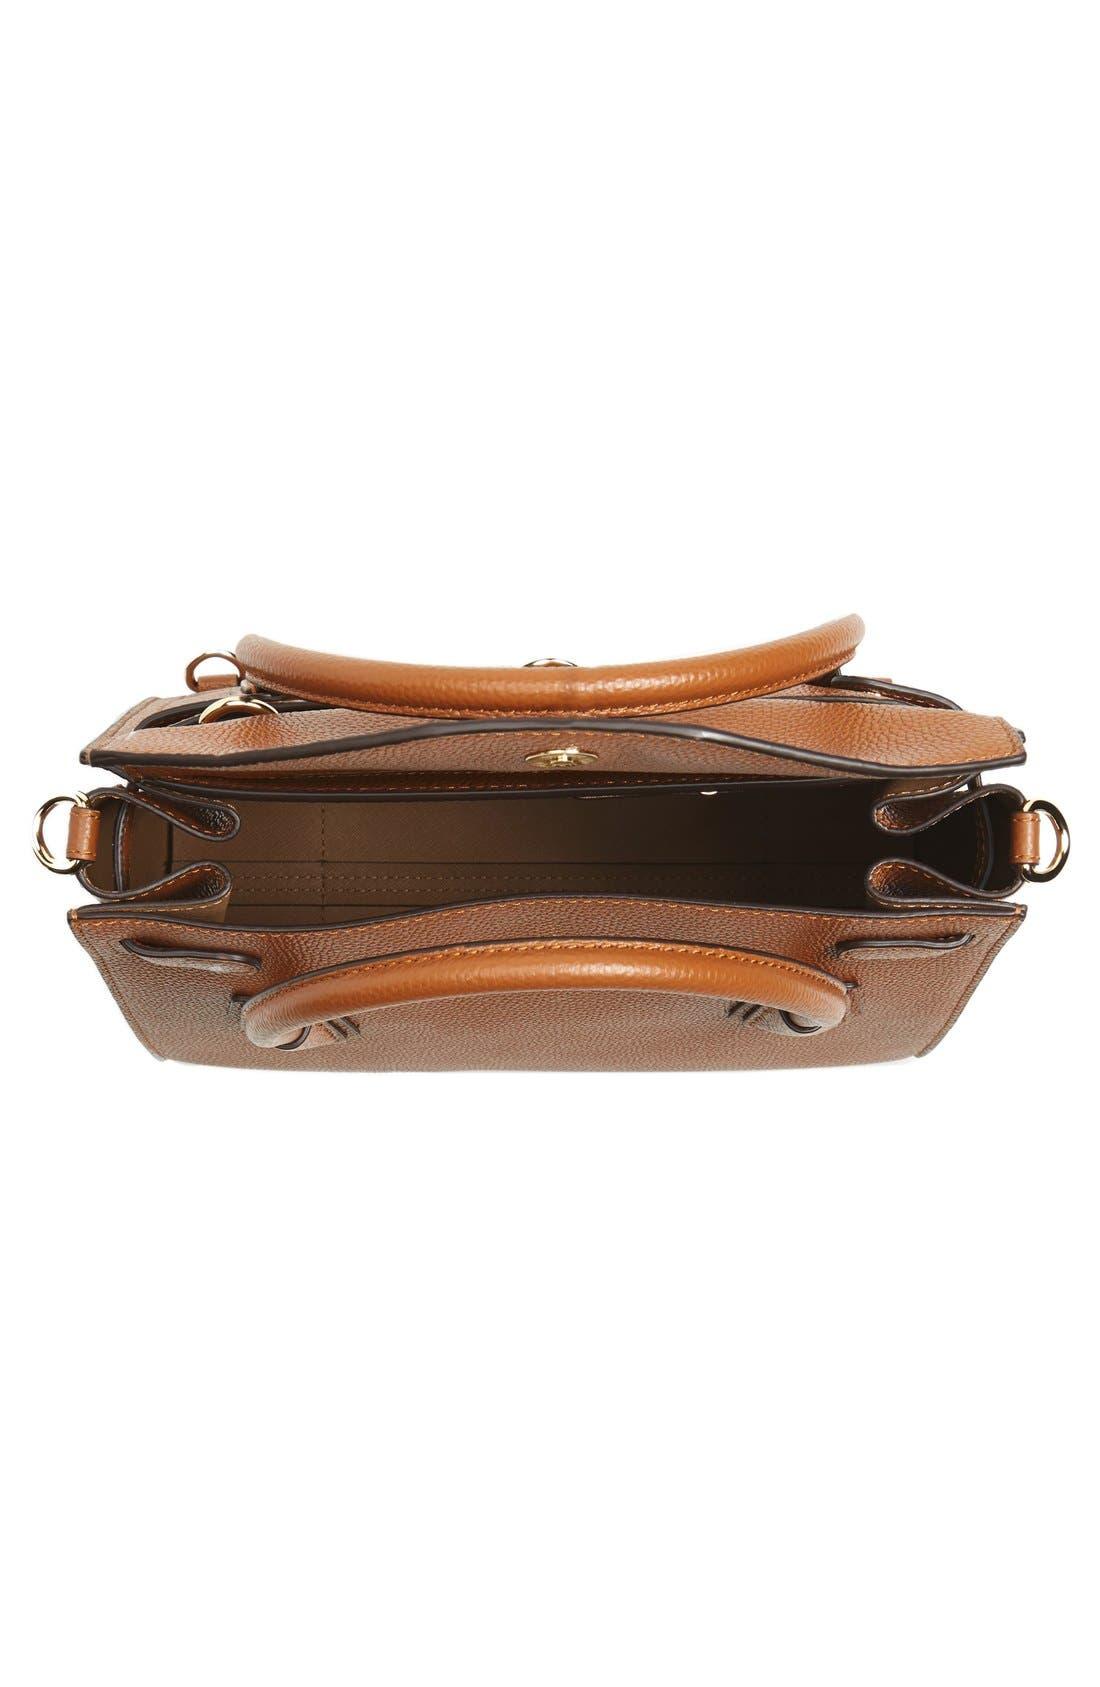 Alternate Image 4  - MICHAEL Michael Kors Large Mercer All-in-One Leather Satchel